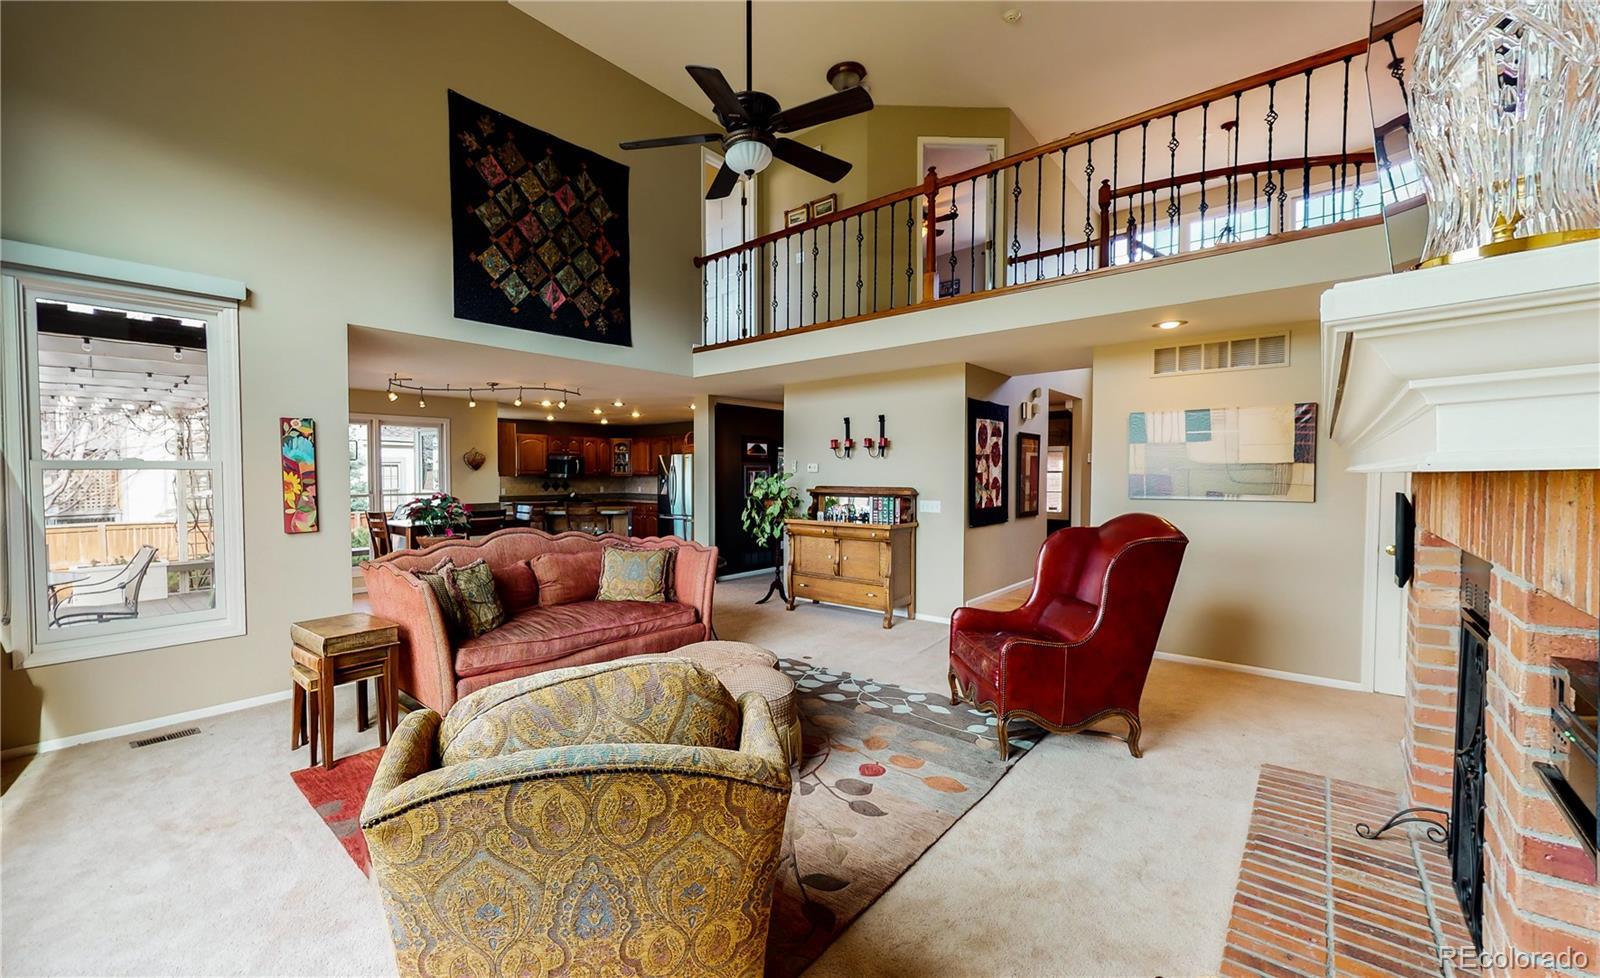 MLS# 9424893 - 7 - 2174 Terrace Drive, Highlands Ranch, CO 80126